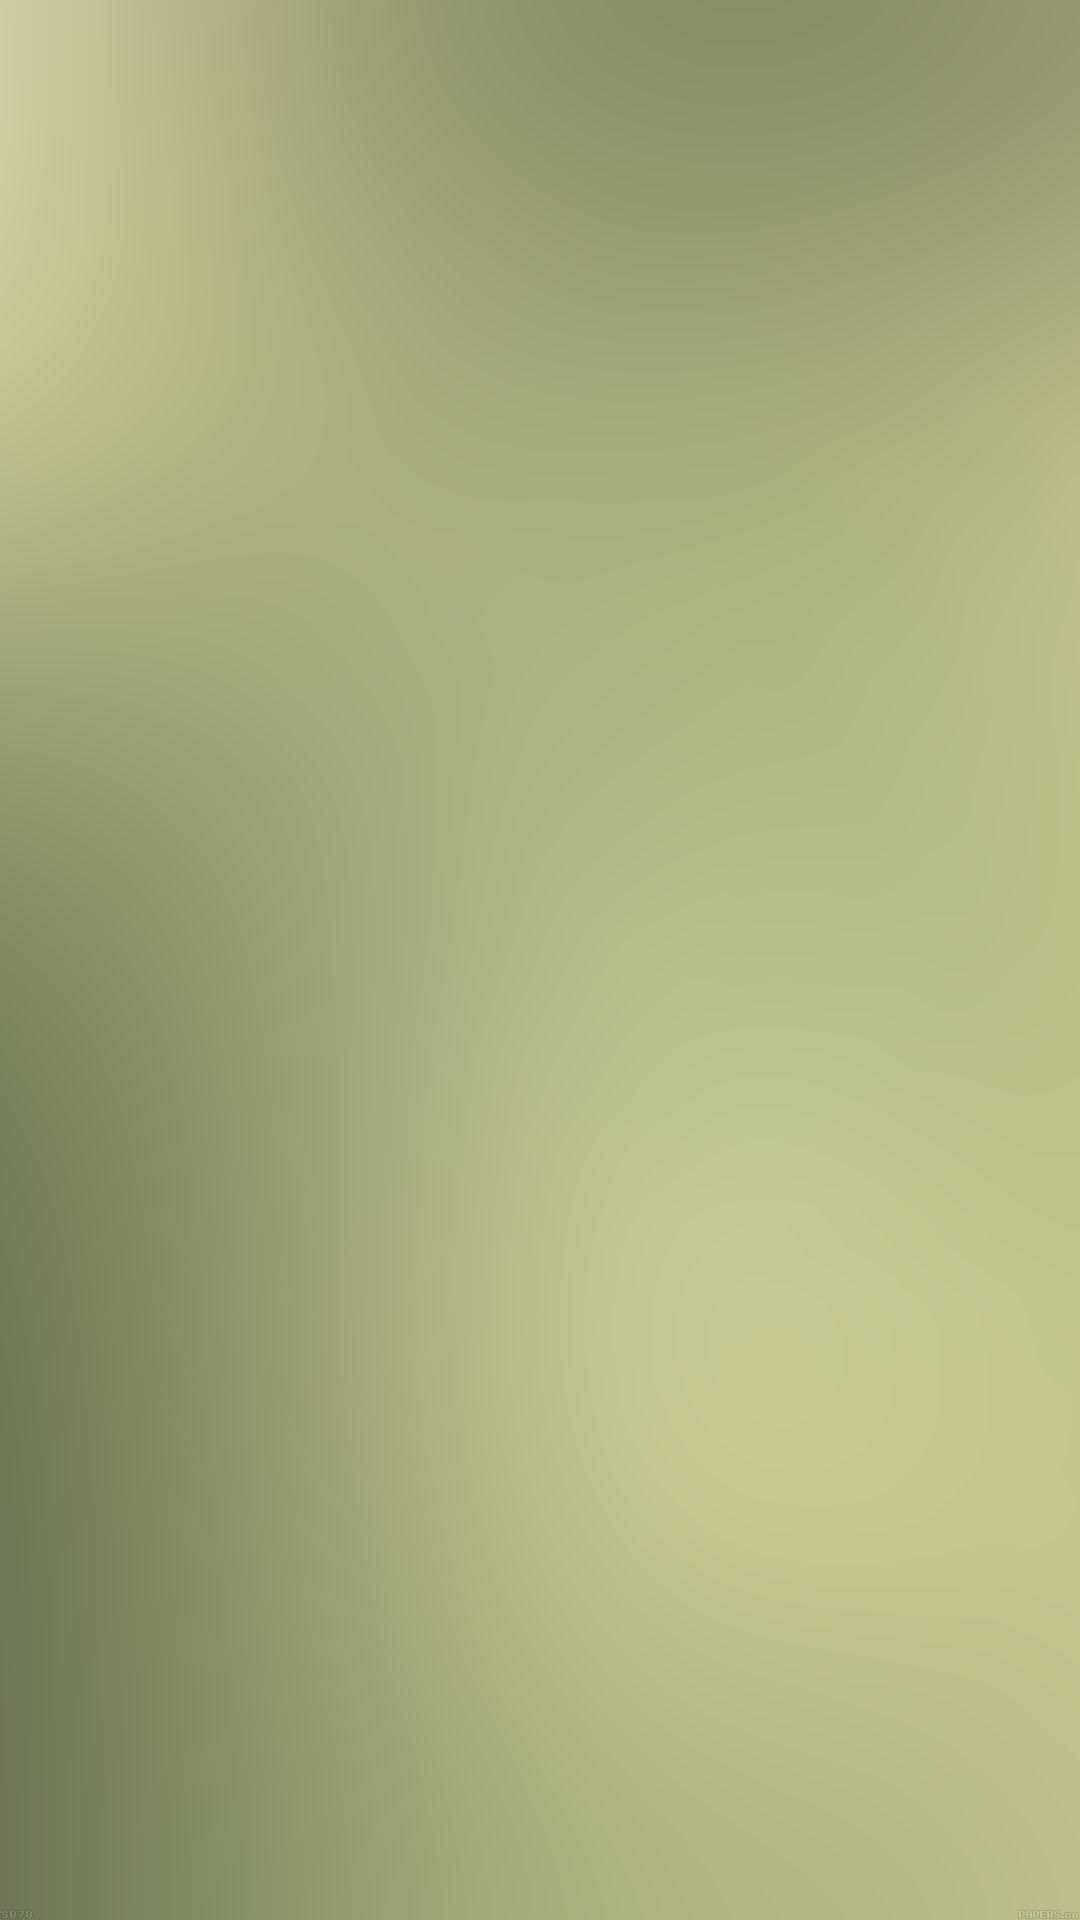 Leaf Nature Green Blur